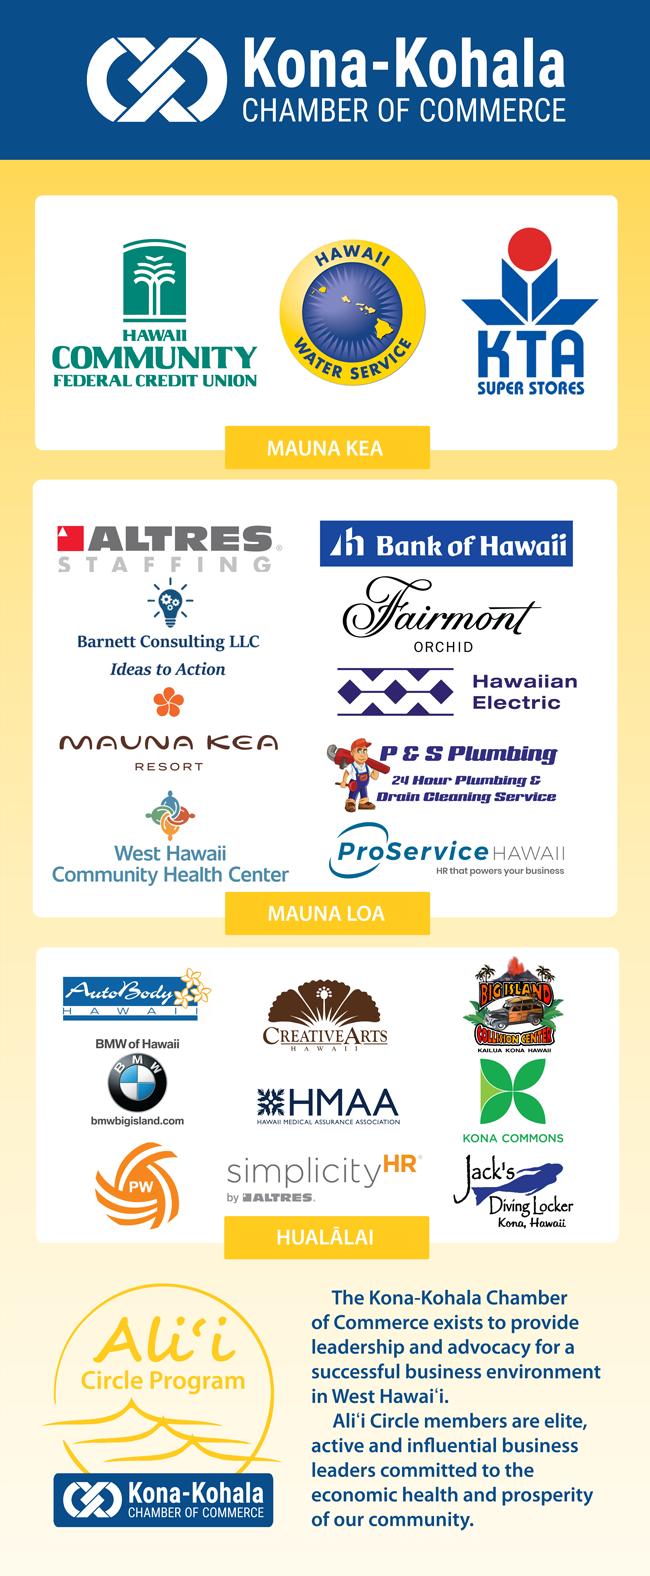 Kona-Kohala Chamber of Commerce Ali'i Circle Members